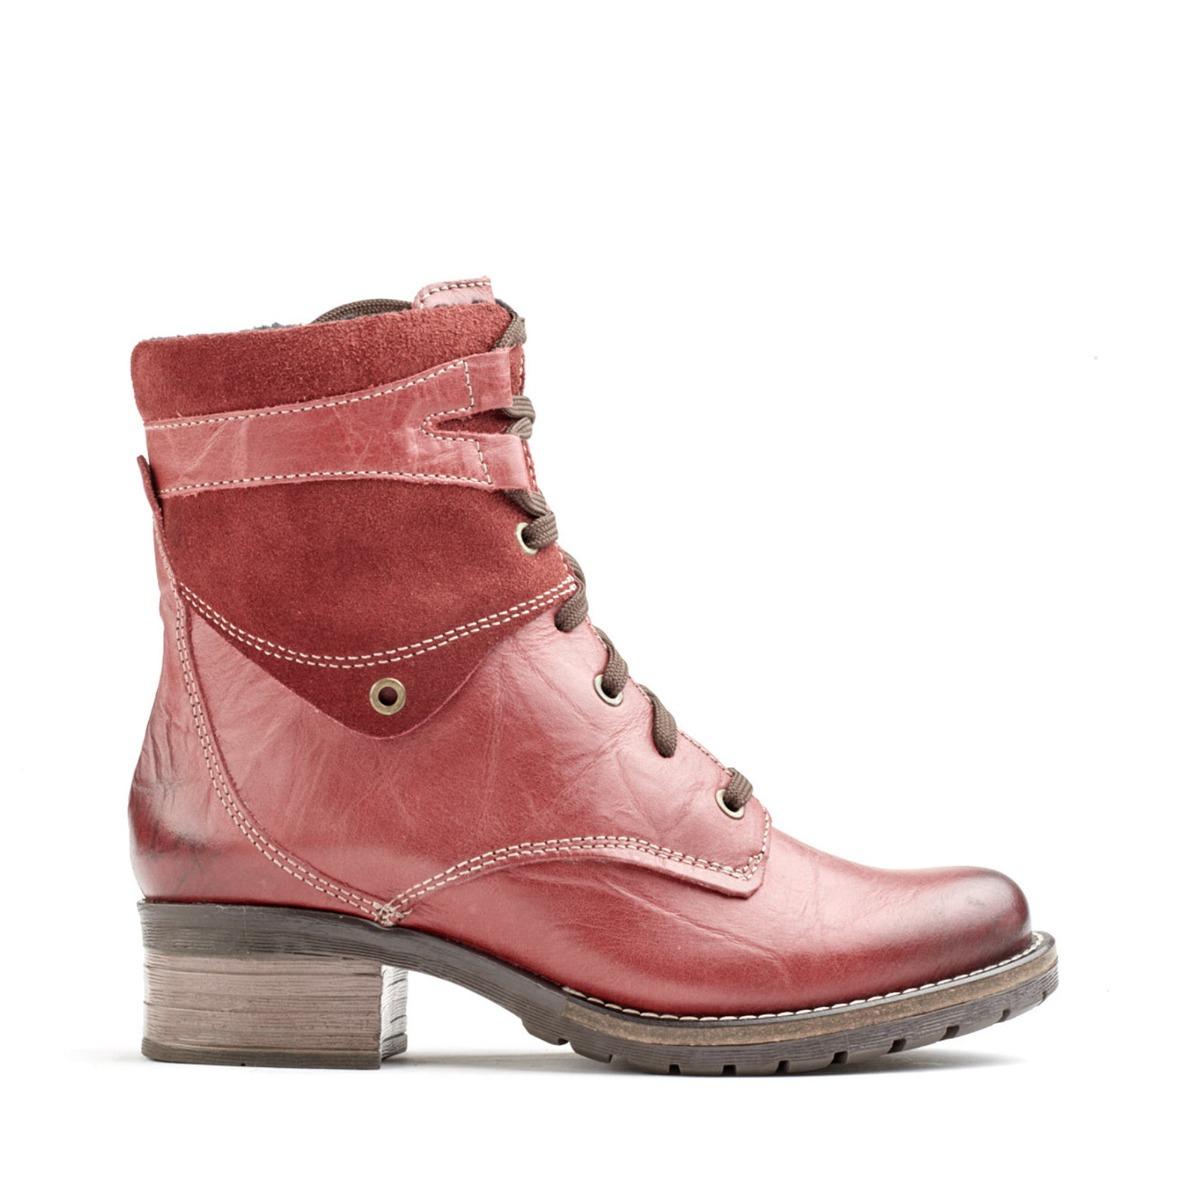 dromedaris boots on sale